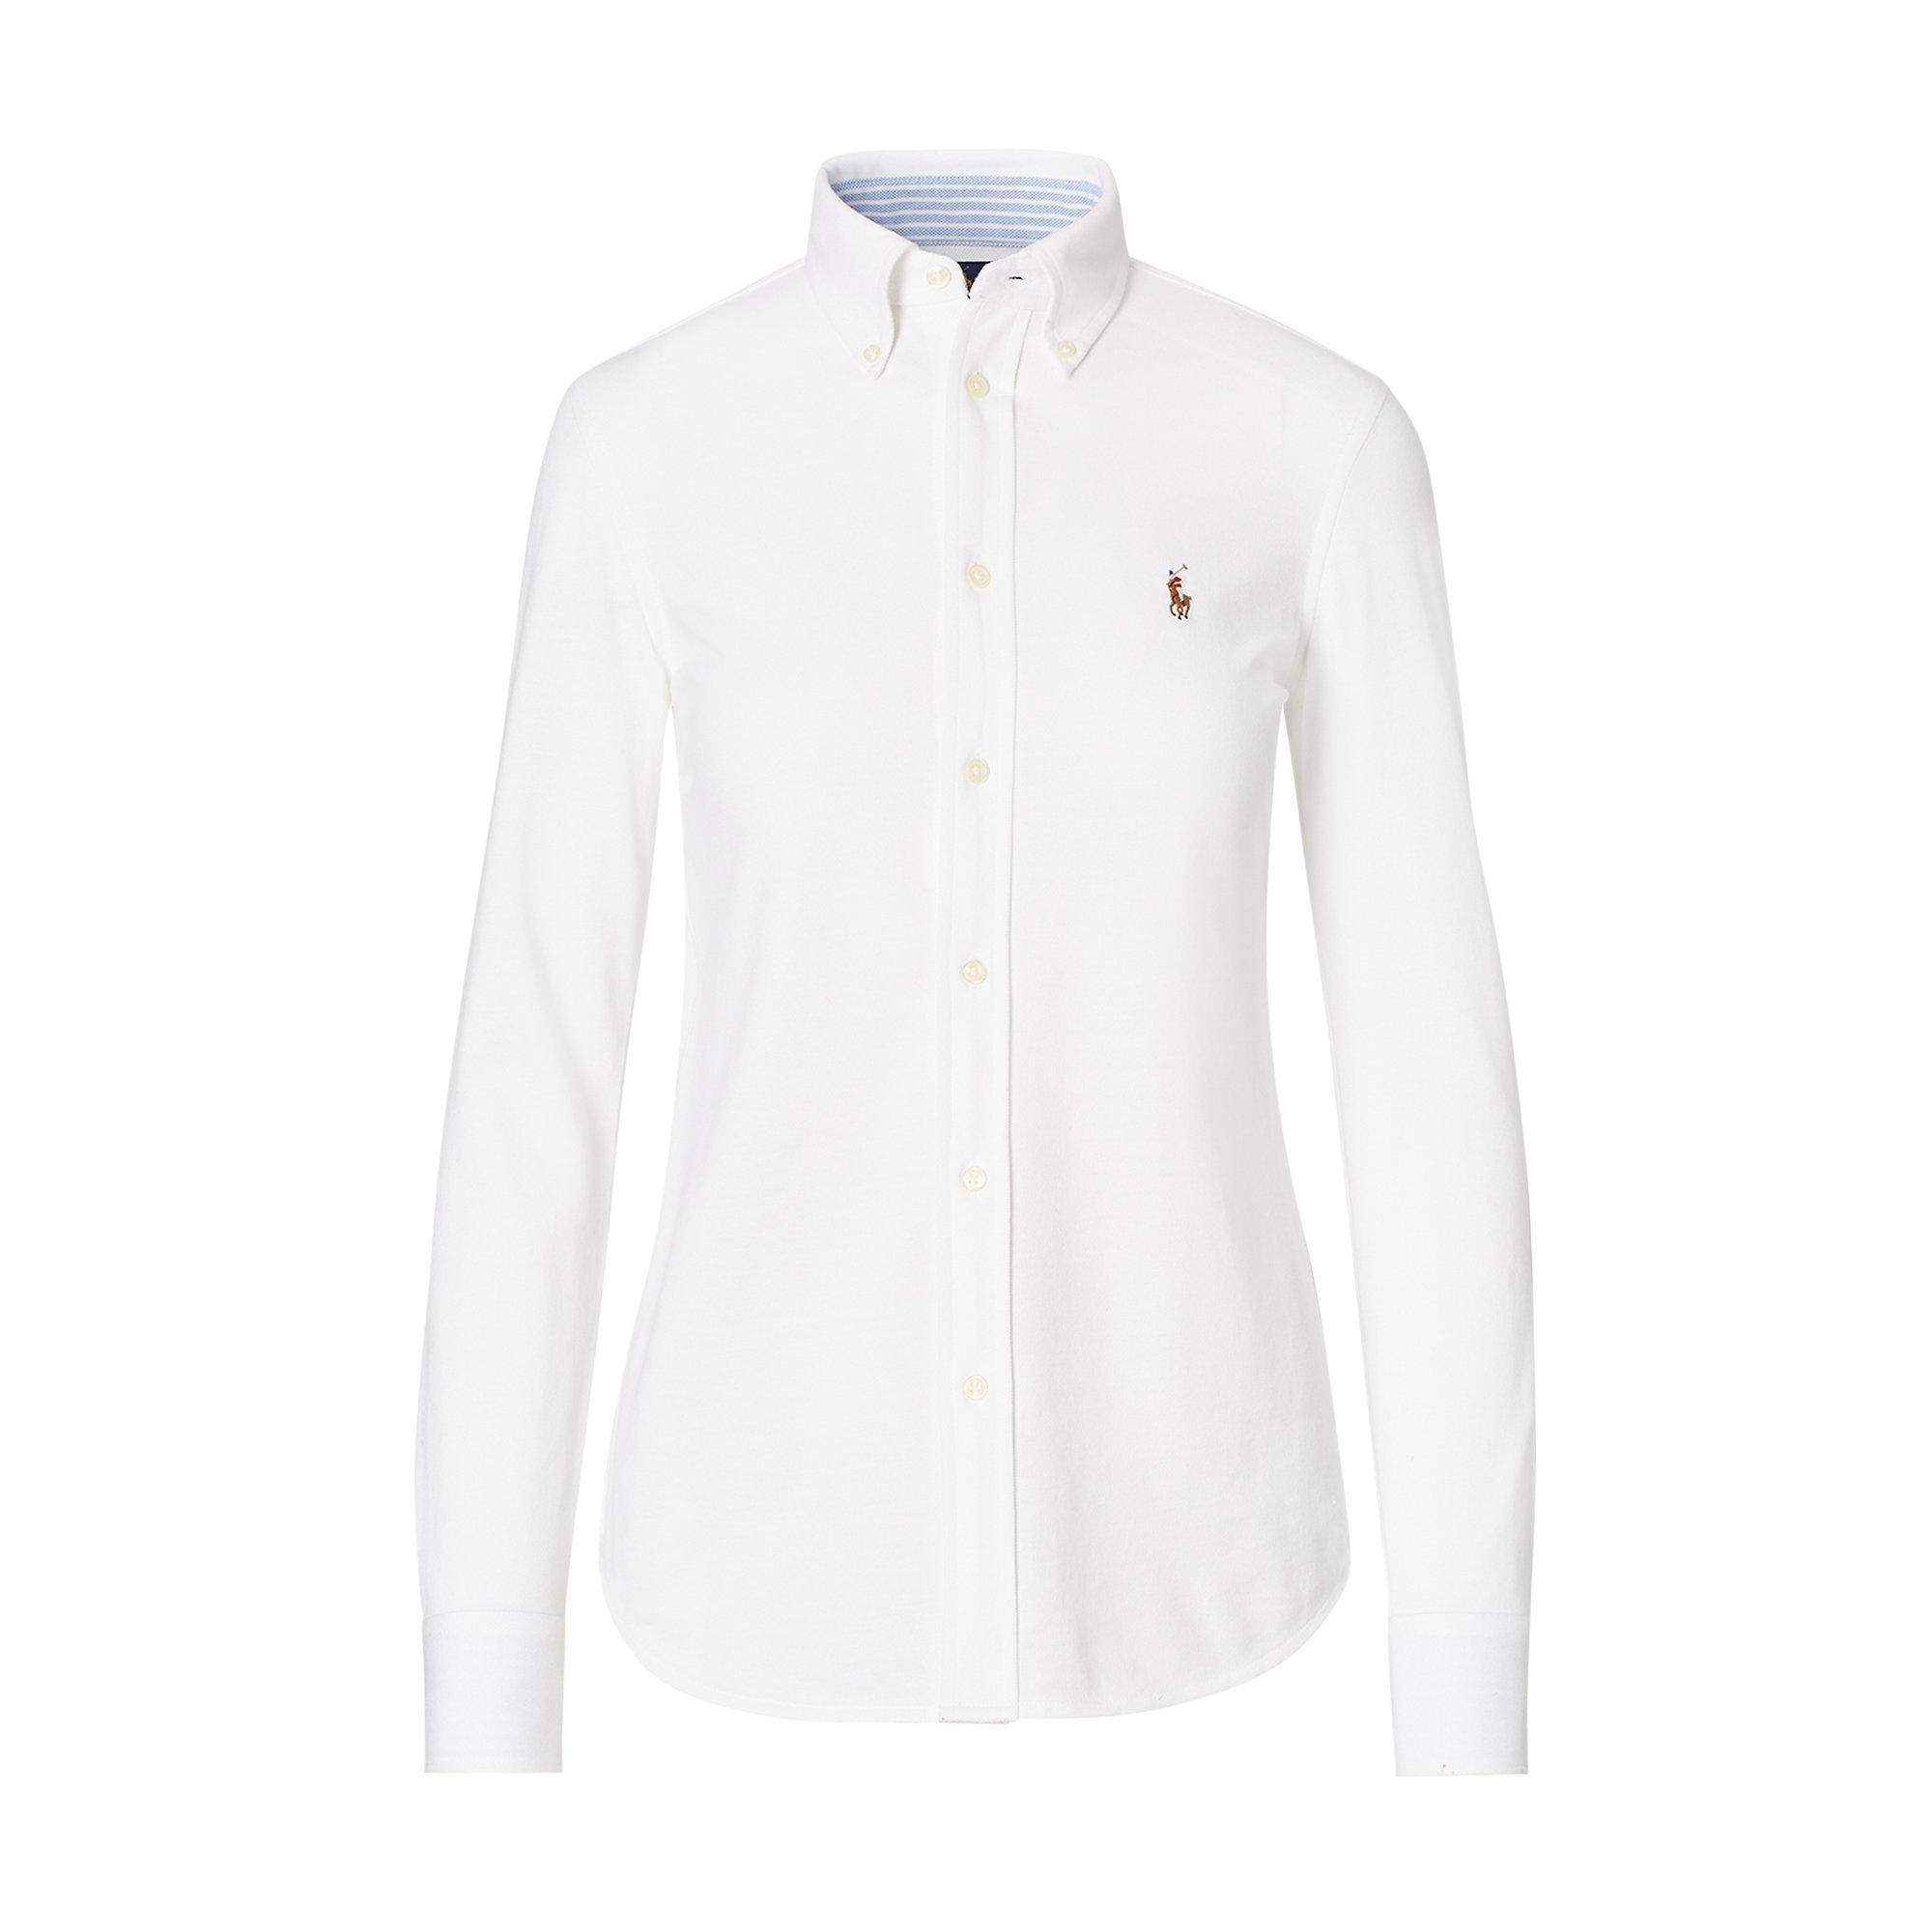 polo ralph lauren knit cotton oxford shirt in white lyst